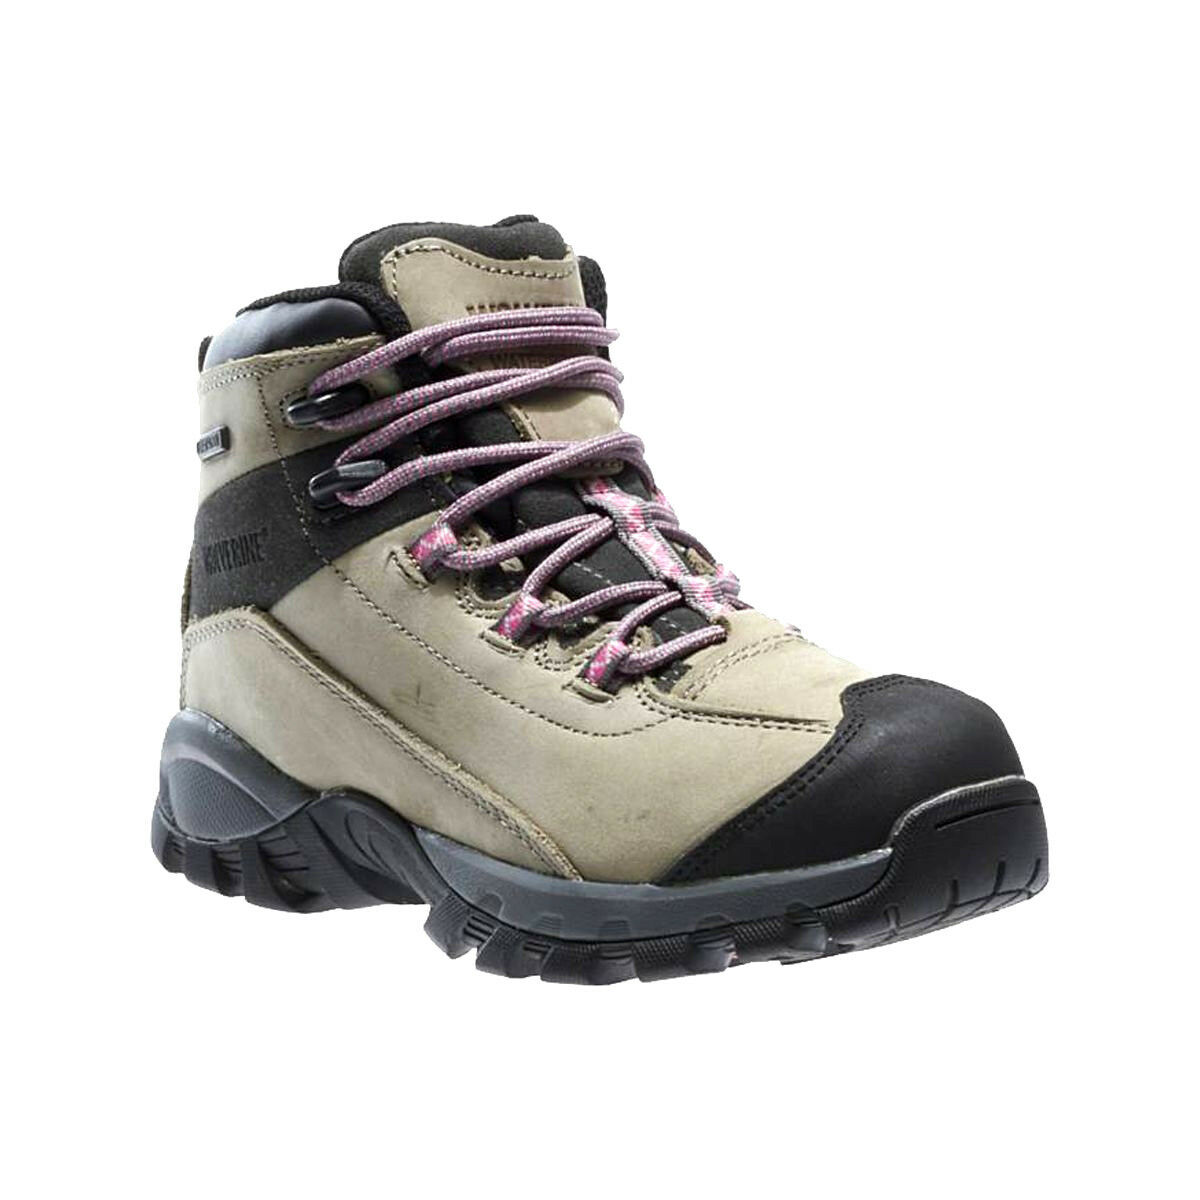 Wolverine Women's Blackledge LX Waterproof Boots Wild Dove Pink